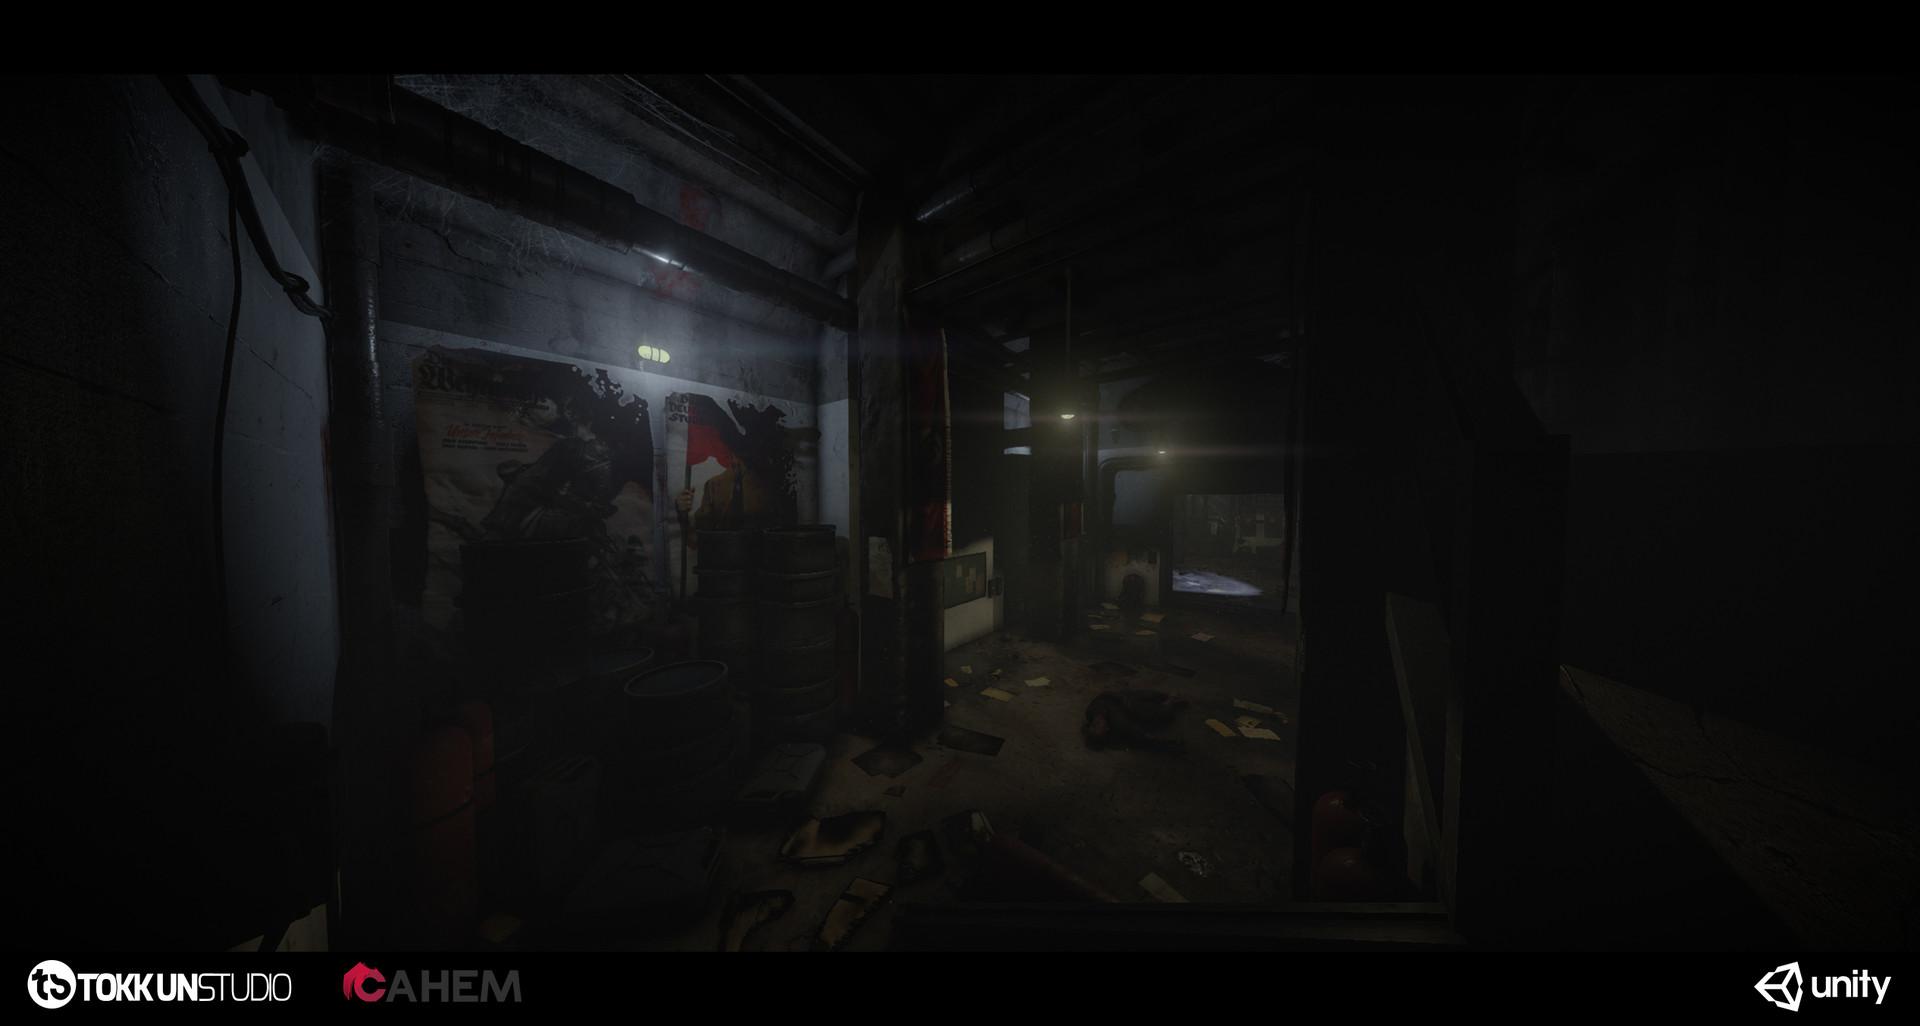 Tokkun studio bunker shot 40